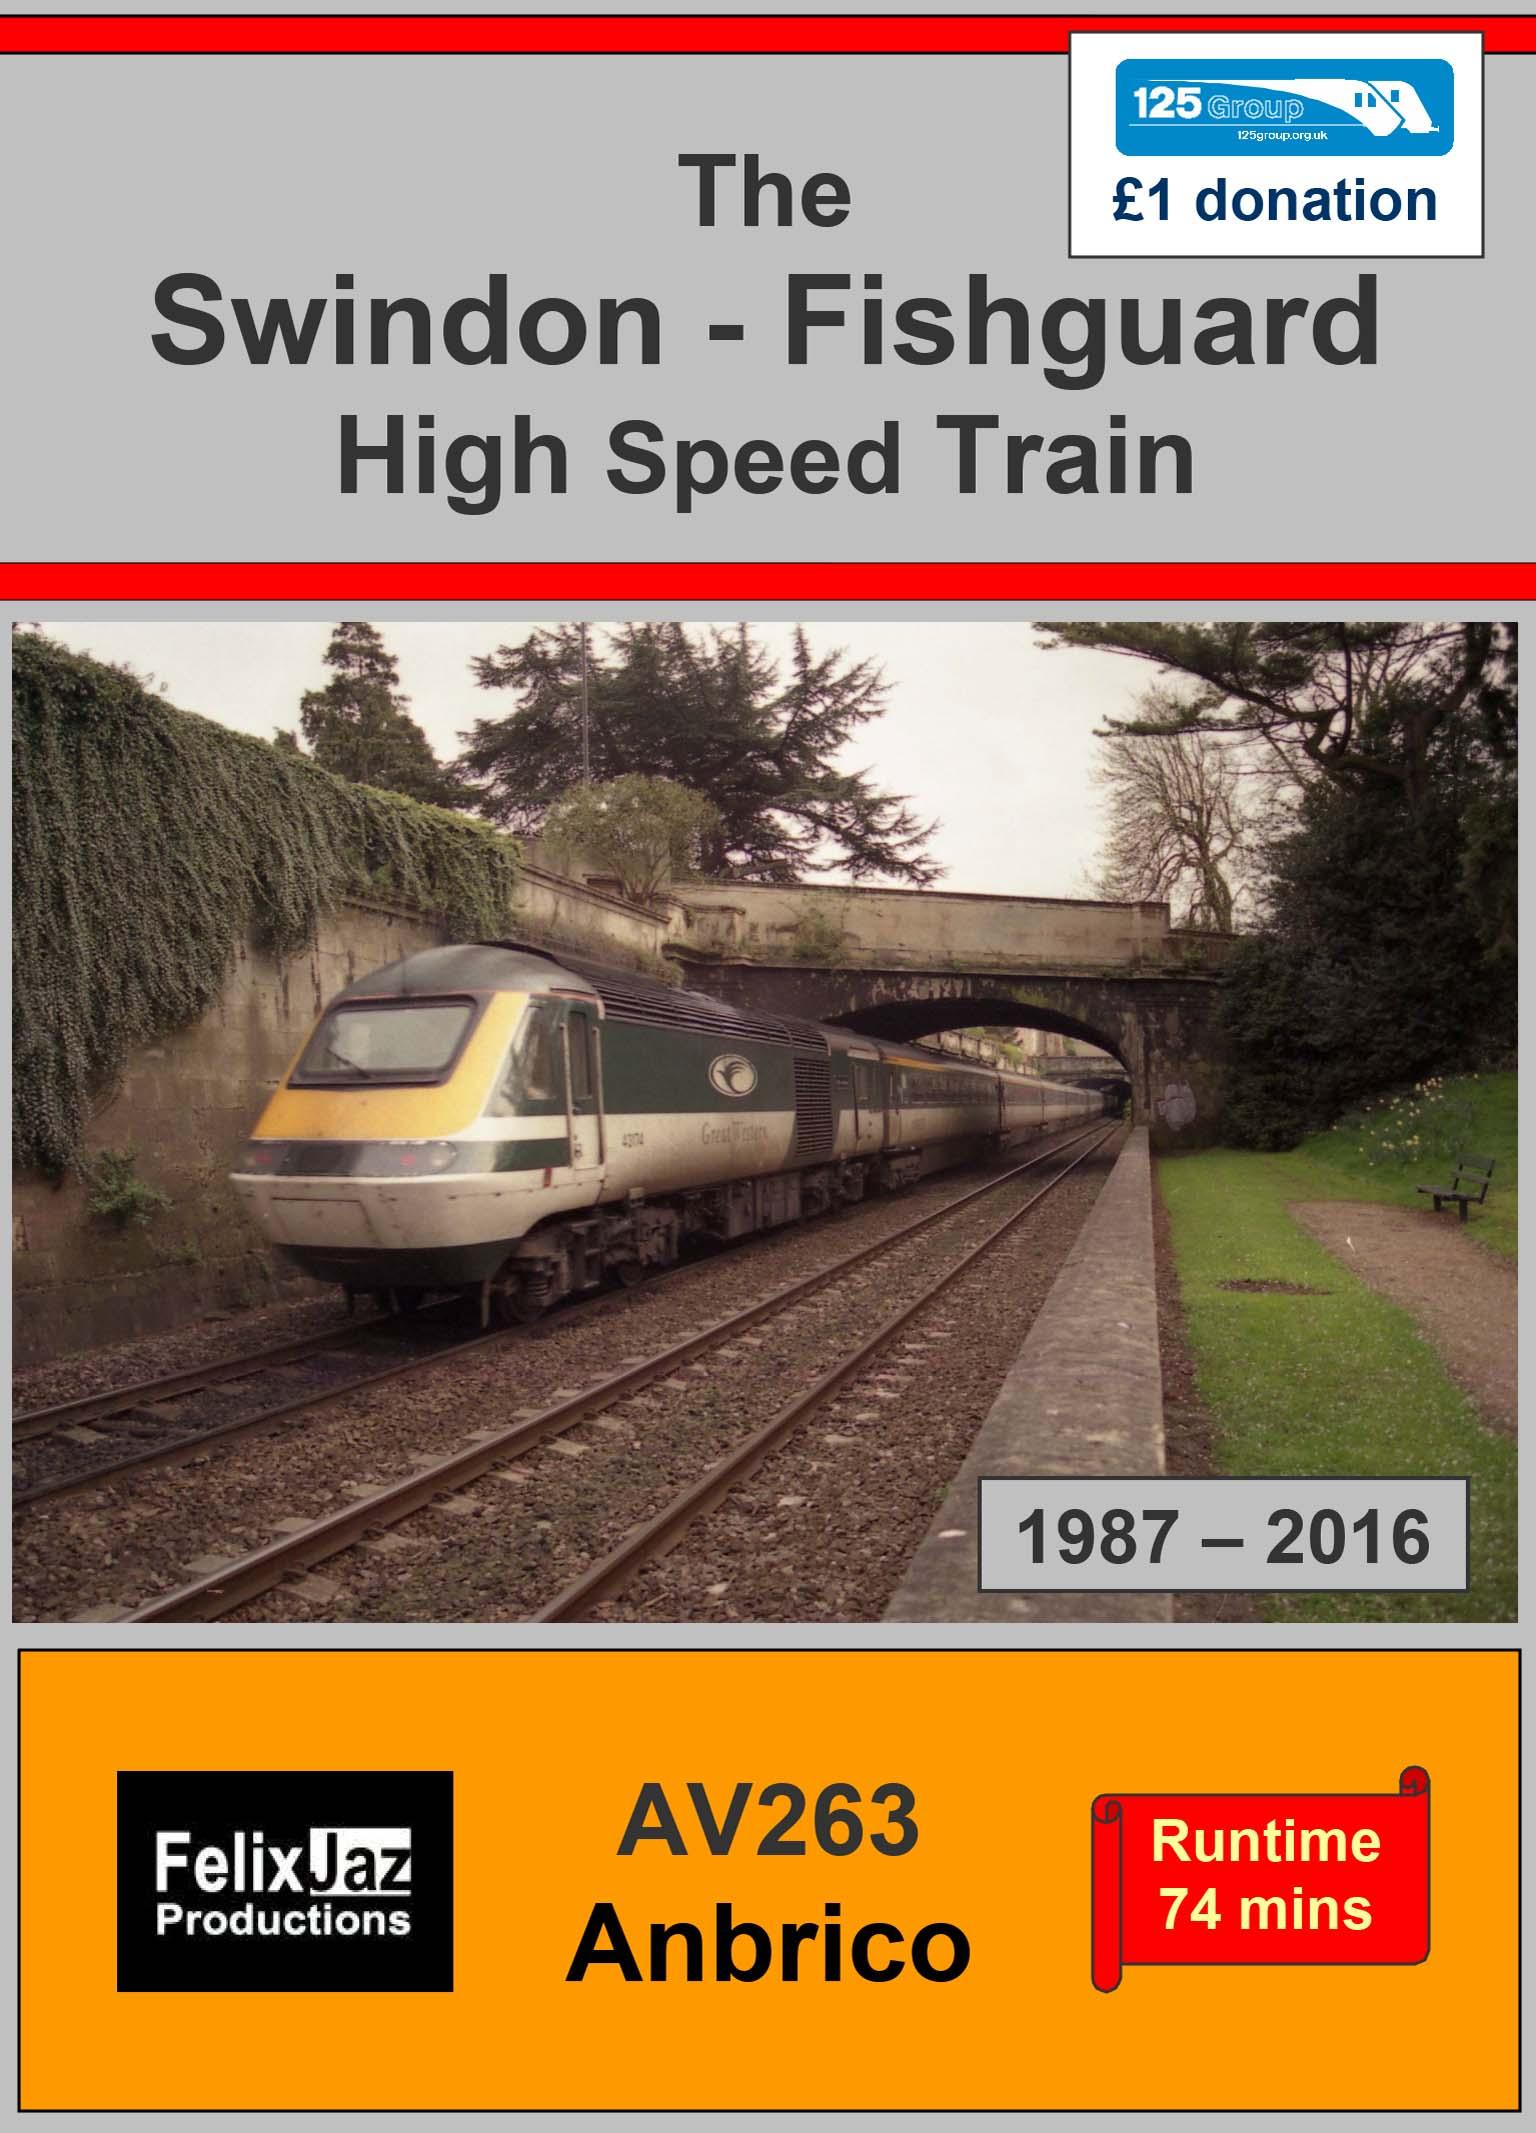 AV263 The Bristol and Swindon to Fishguard High Speed Train